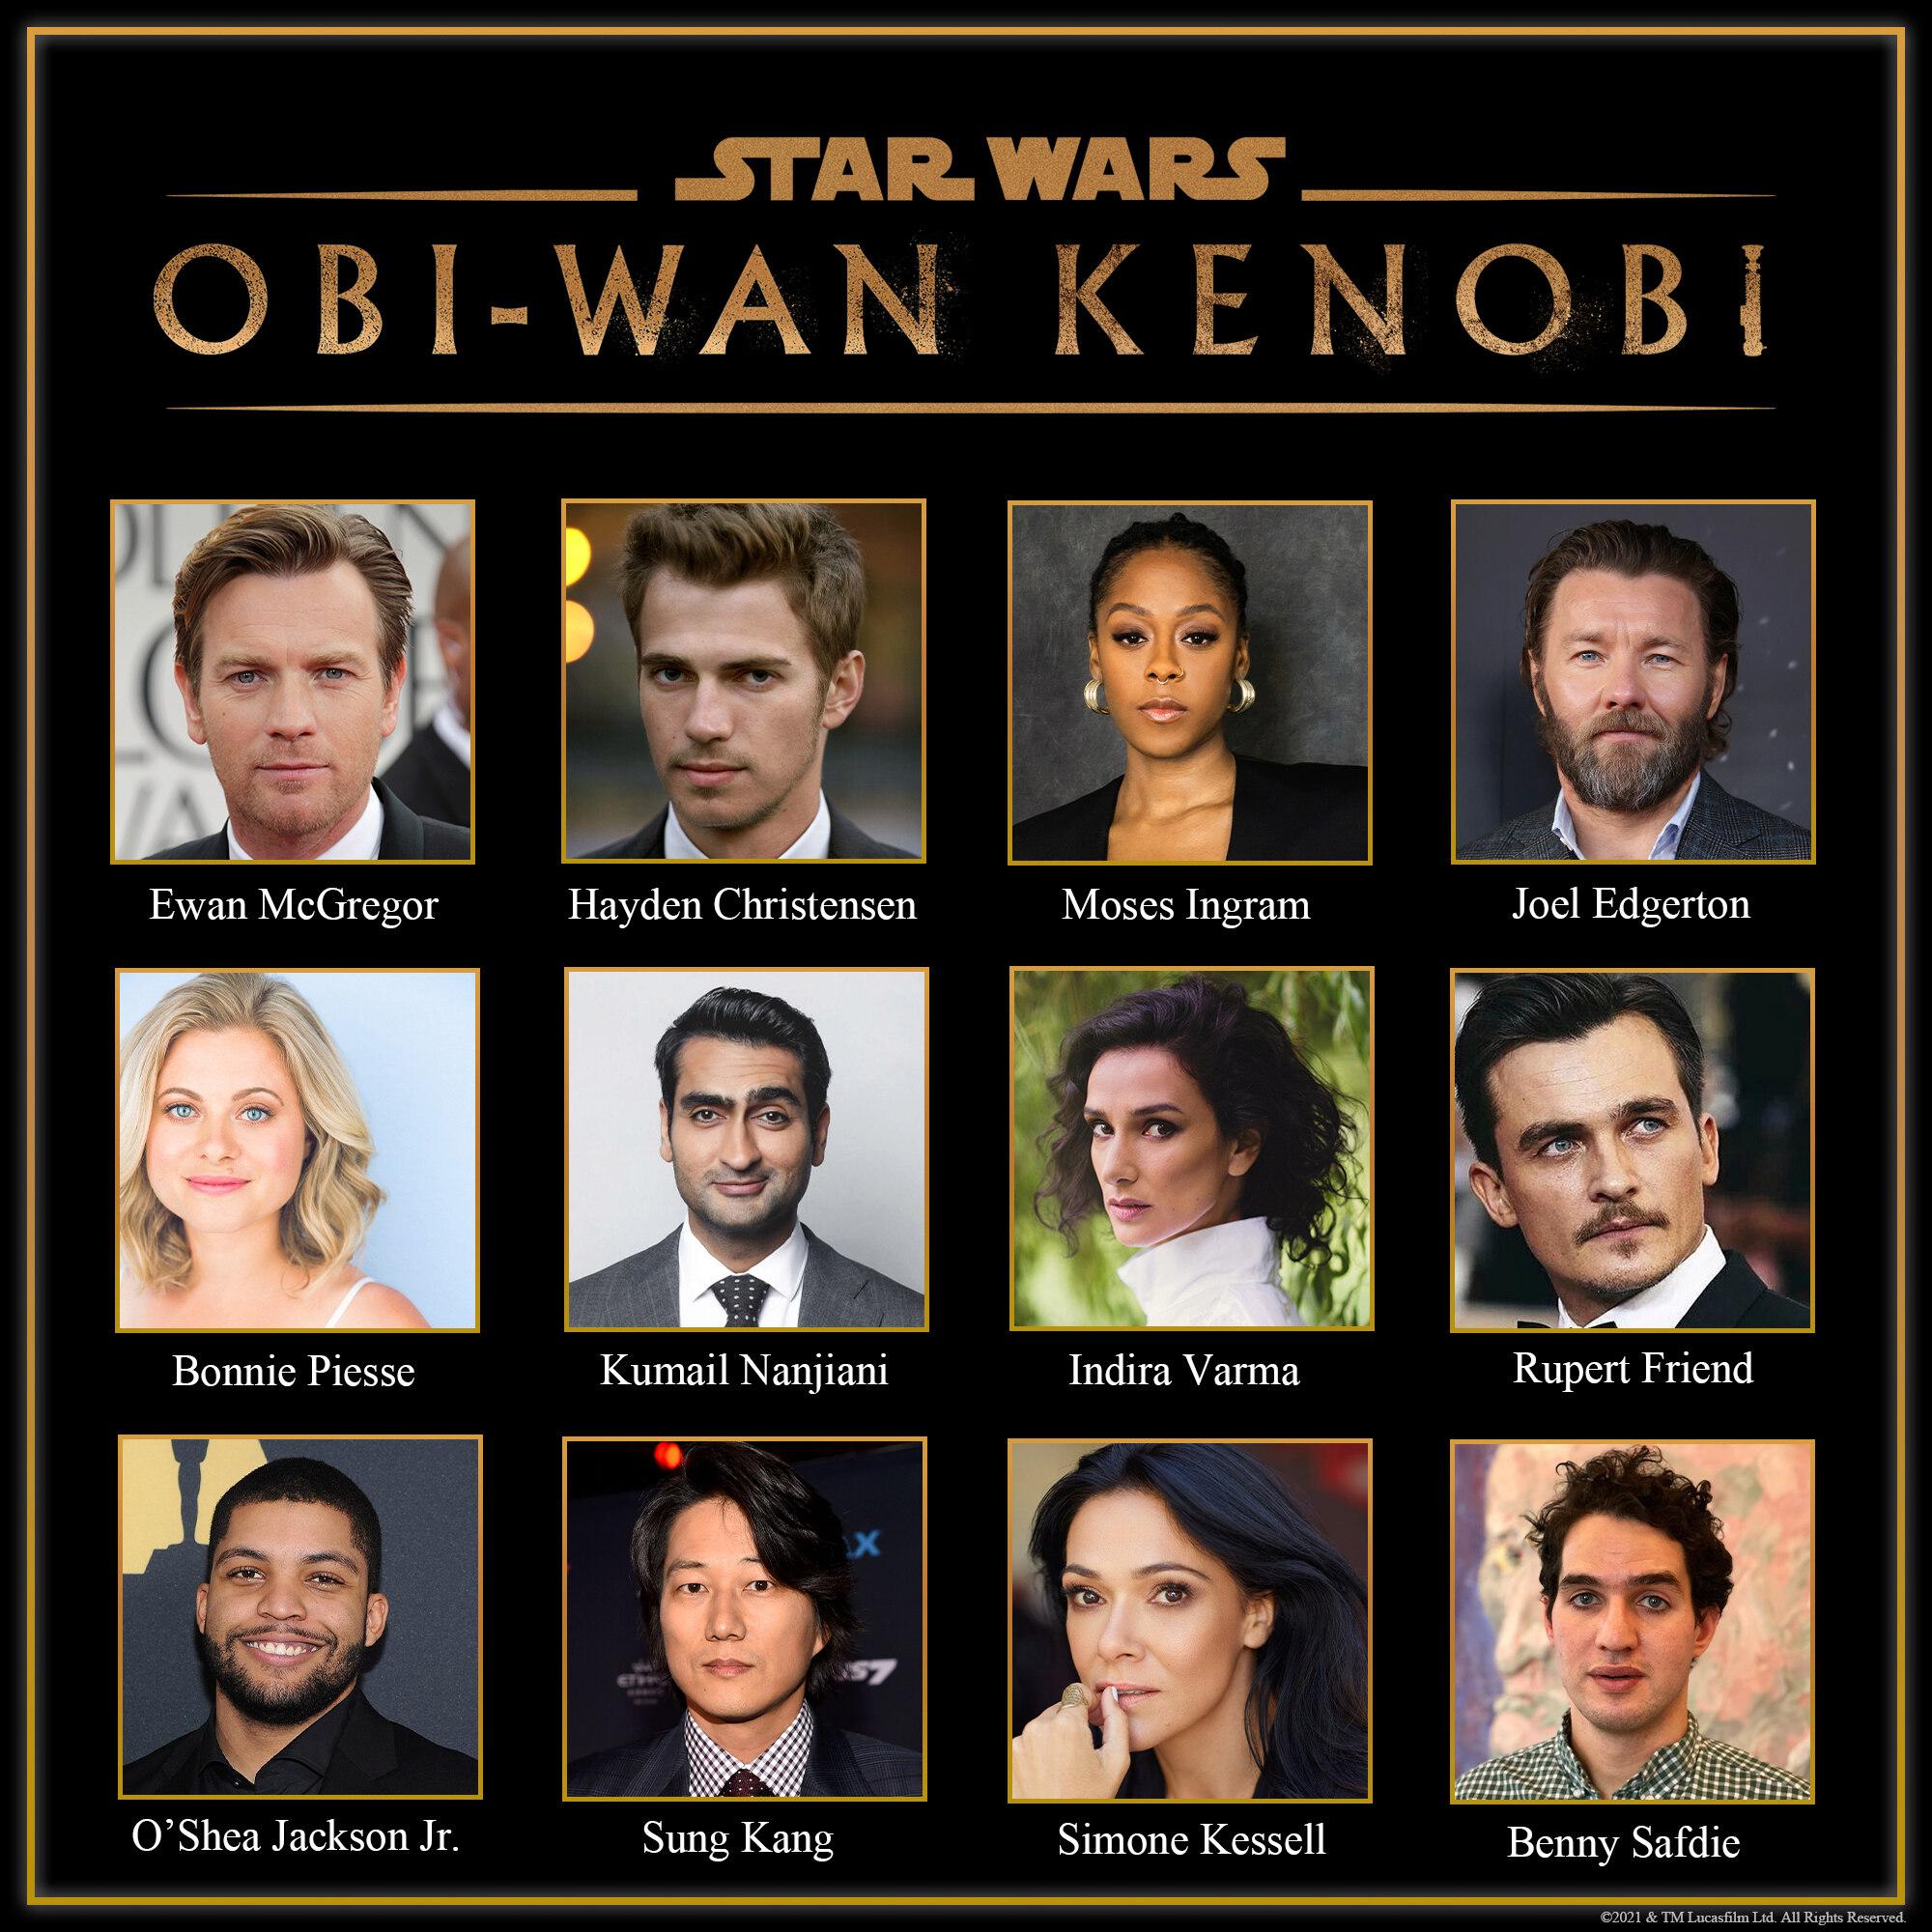 [Film] Star Wars - 3eme Spin off: Obi Wan Kenobi 11868